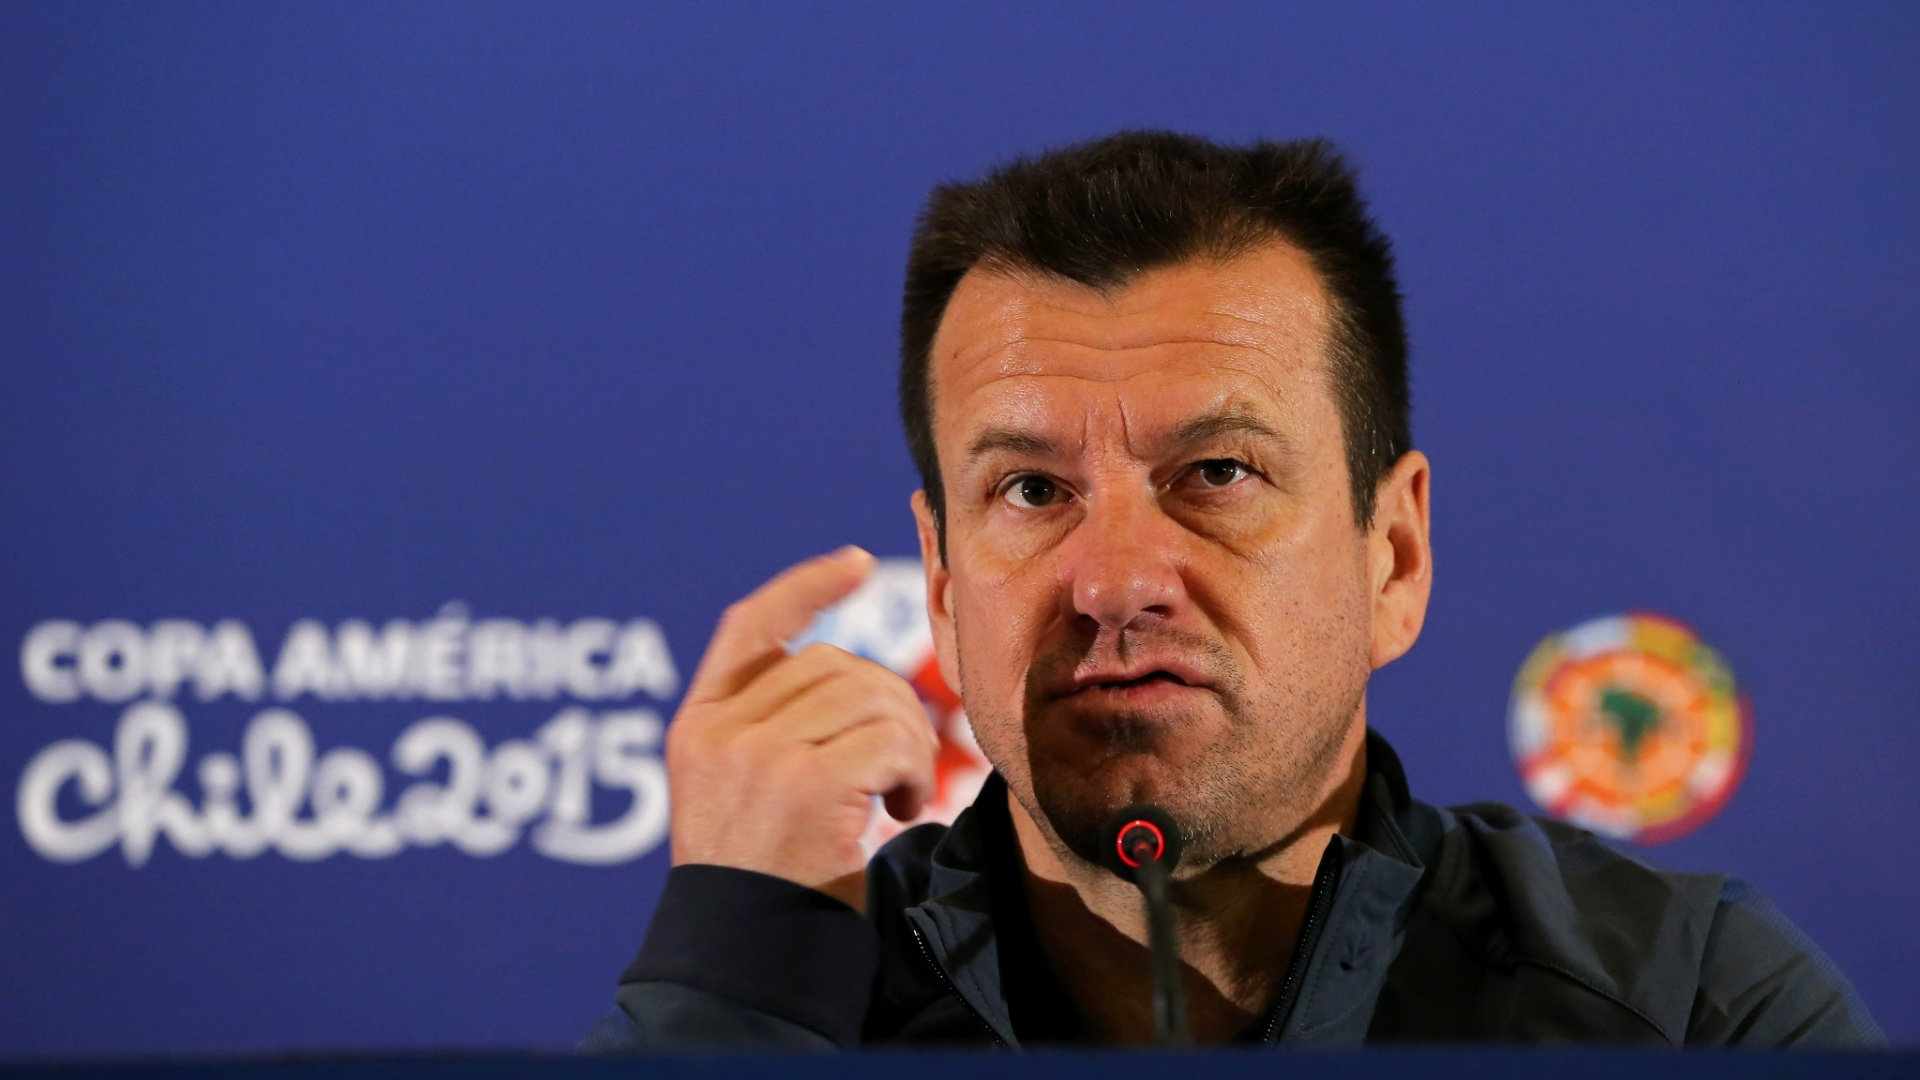 Técnico Dunga gesticula durante entrevista coletiva no Chile durante a Copa América 2015